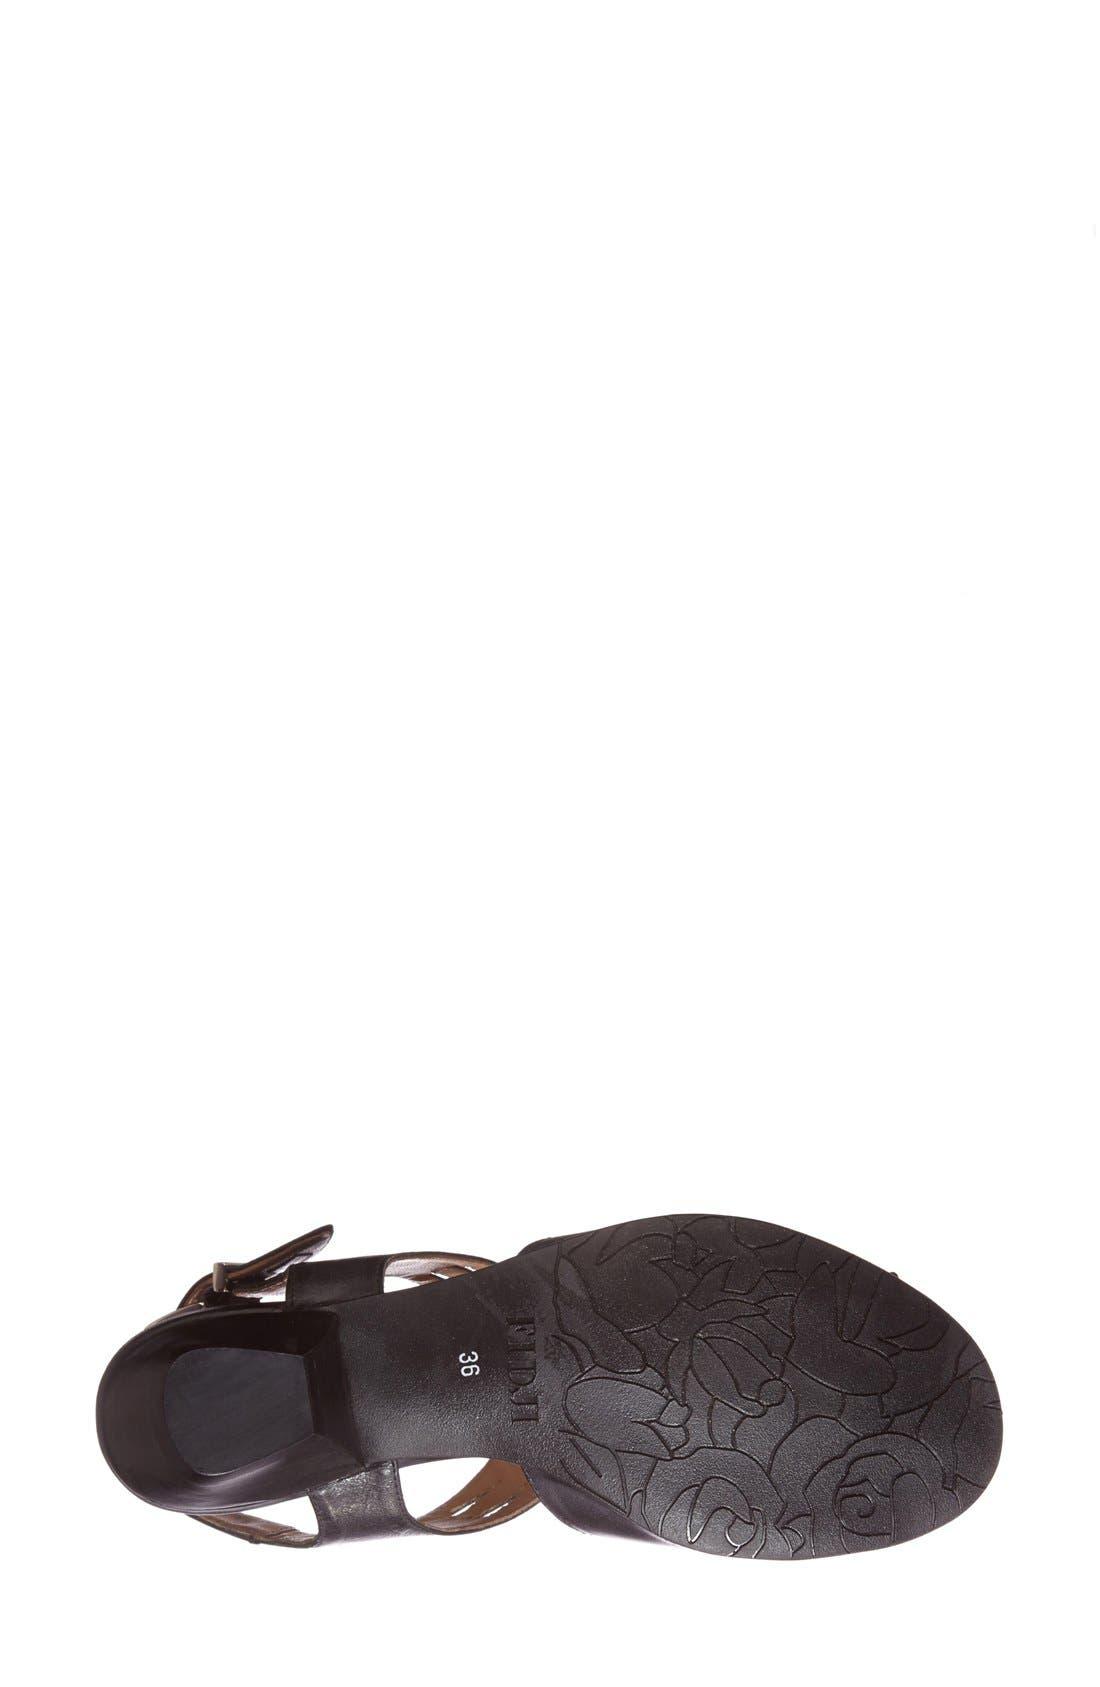 'V112' Perforated Leather Sandal,                             Alternate thumbnail 4, color,                             Black